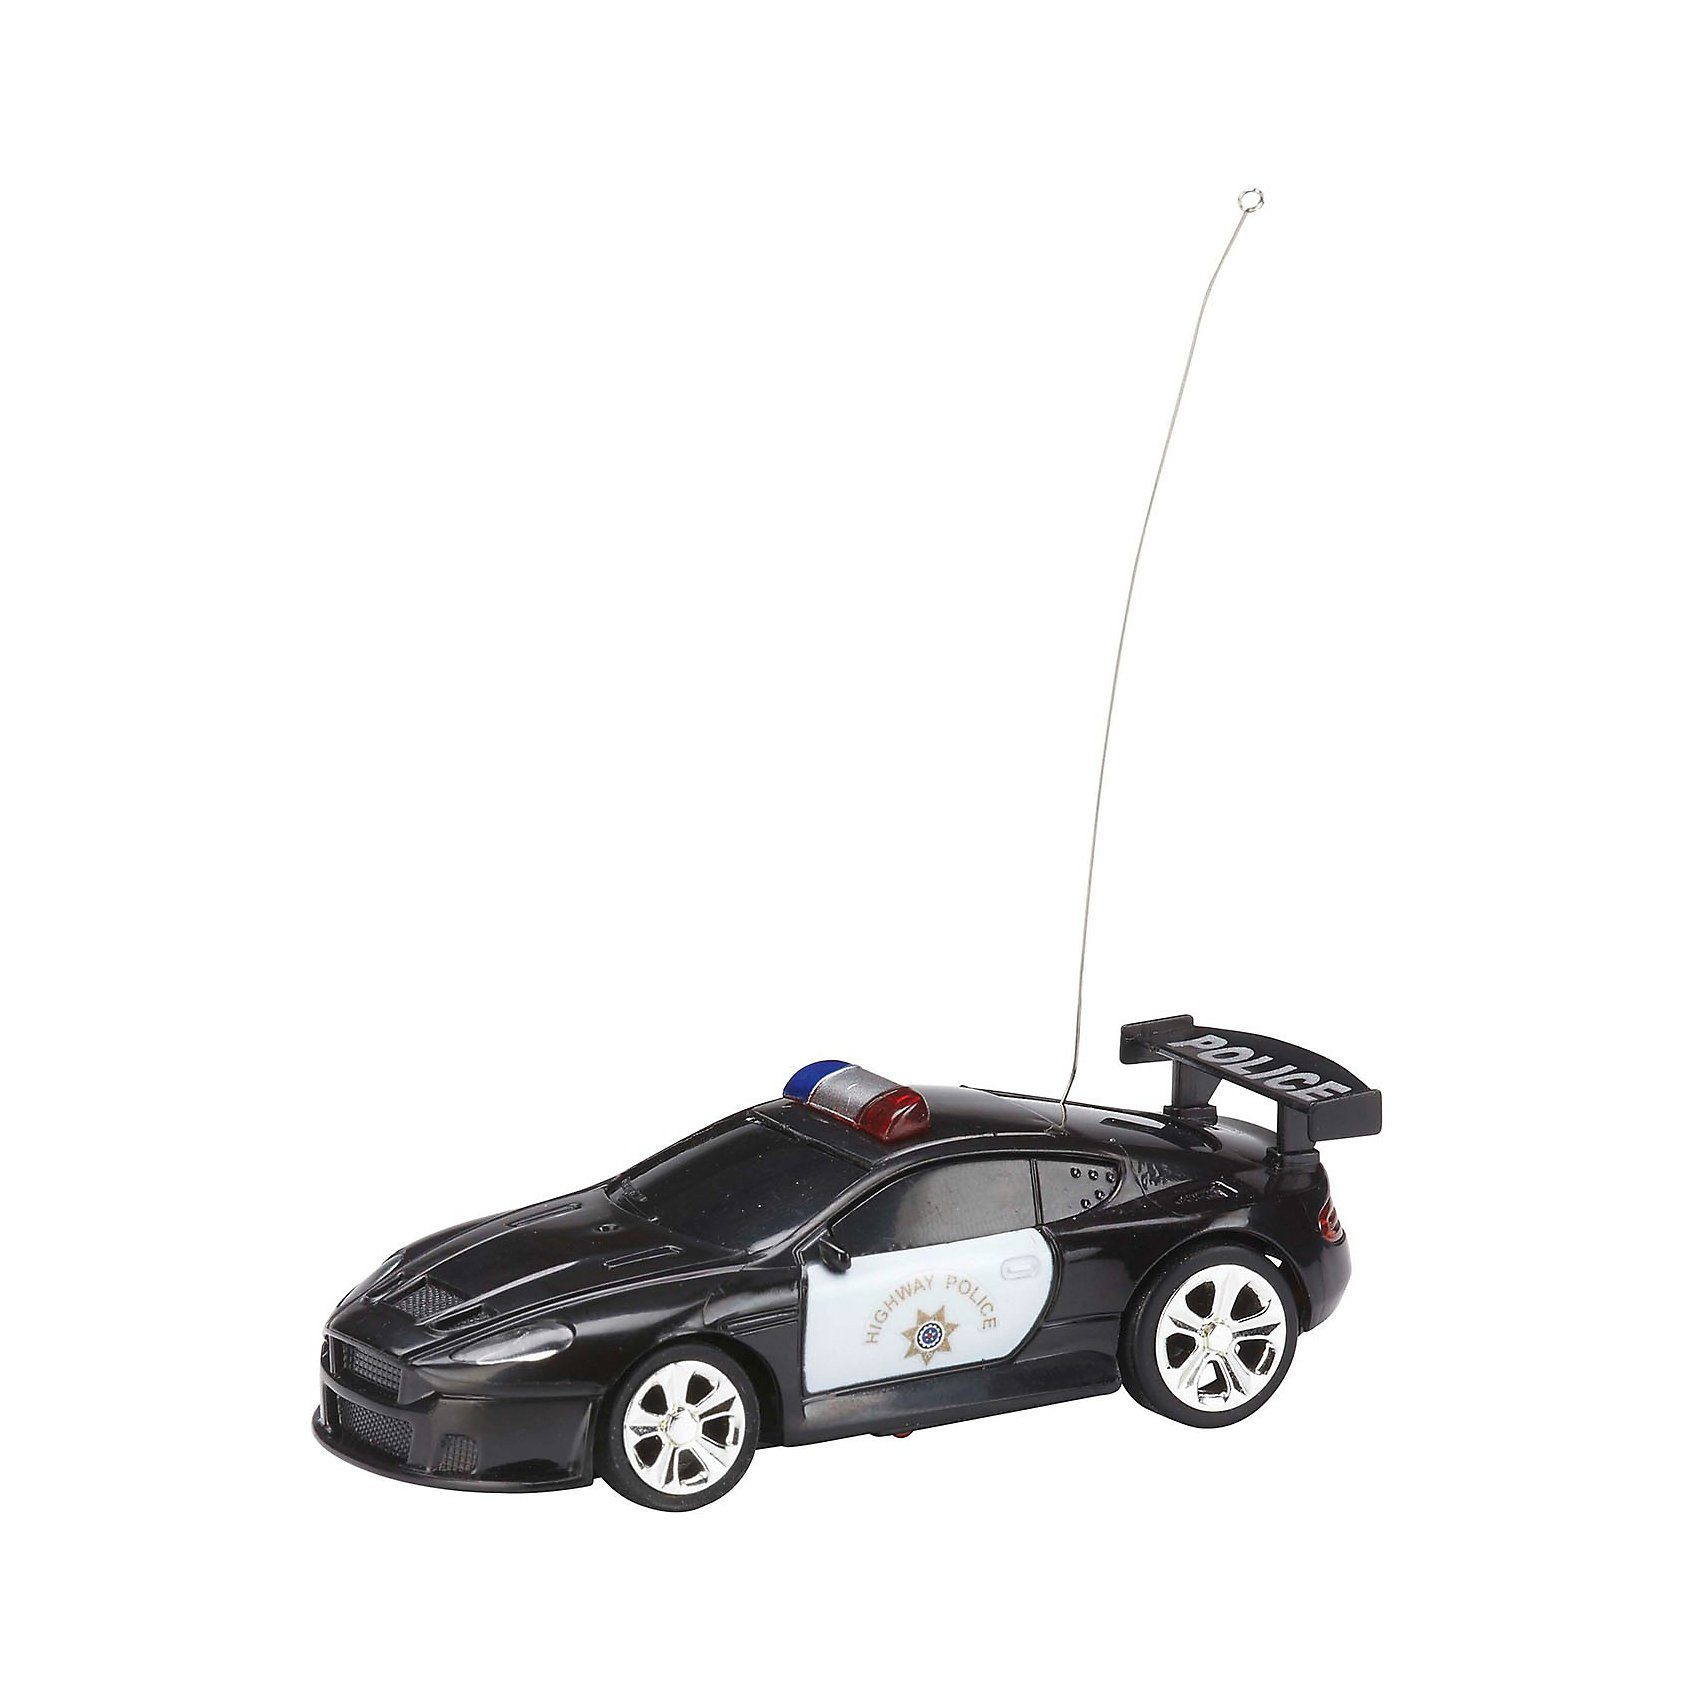 Revell RC Mini Polizeiwagen